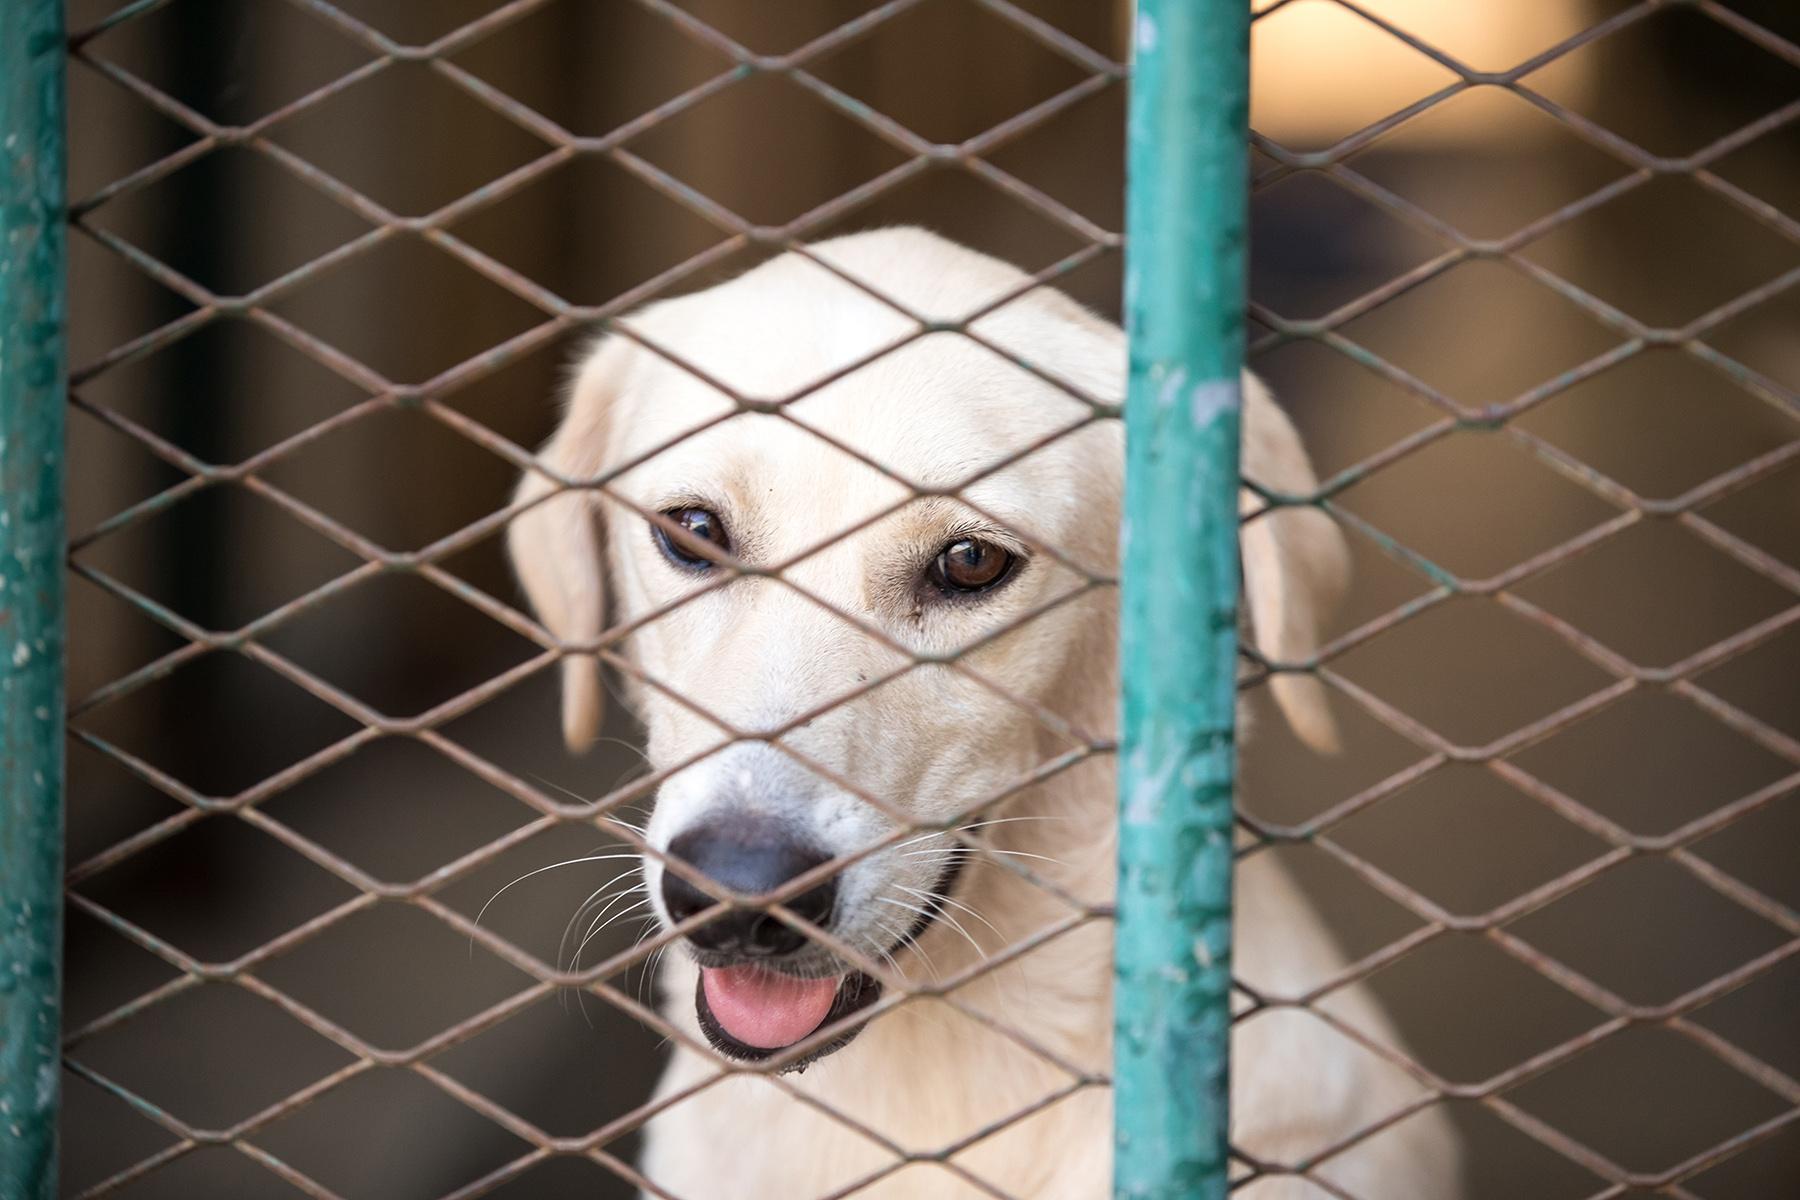 Dog at an animal shelter